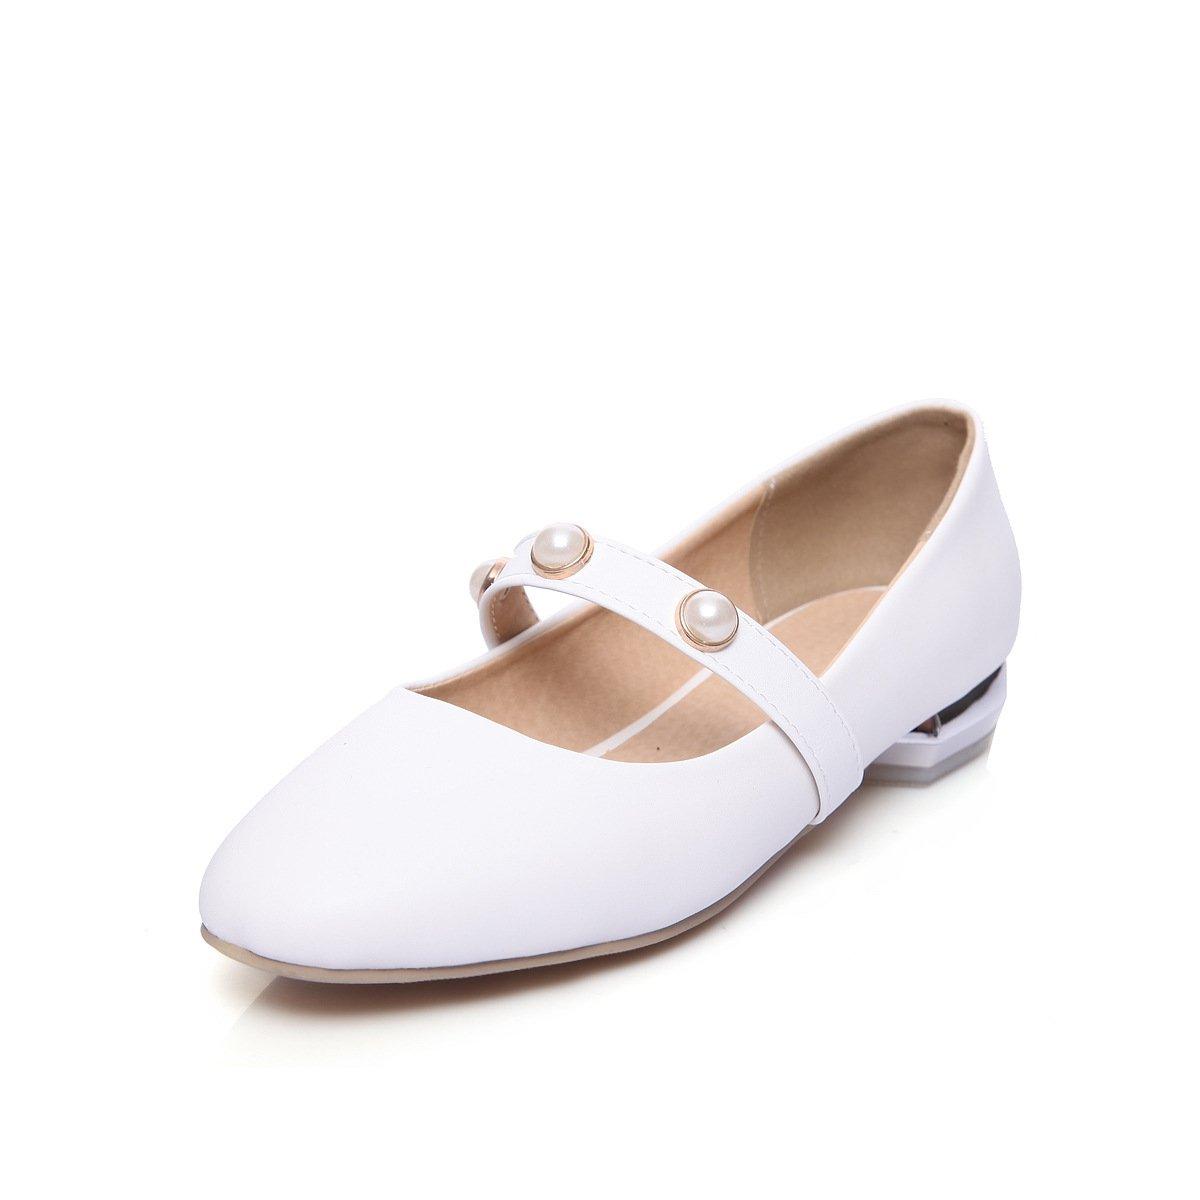 LSM-Heels MEI&S Damen Square Toe Niedrigem Absatz Flach Mund Schuhe